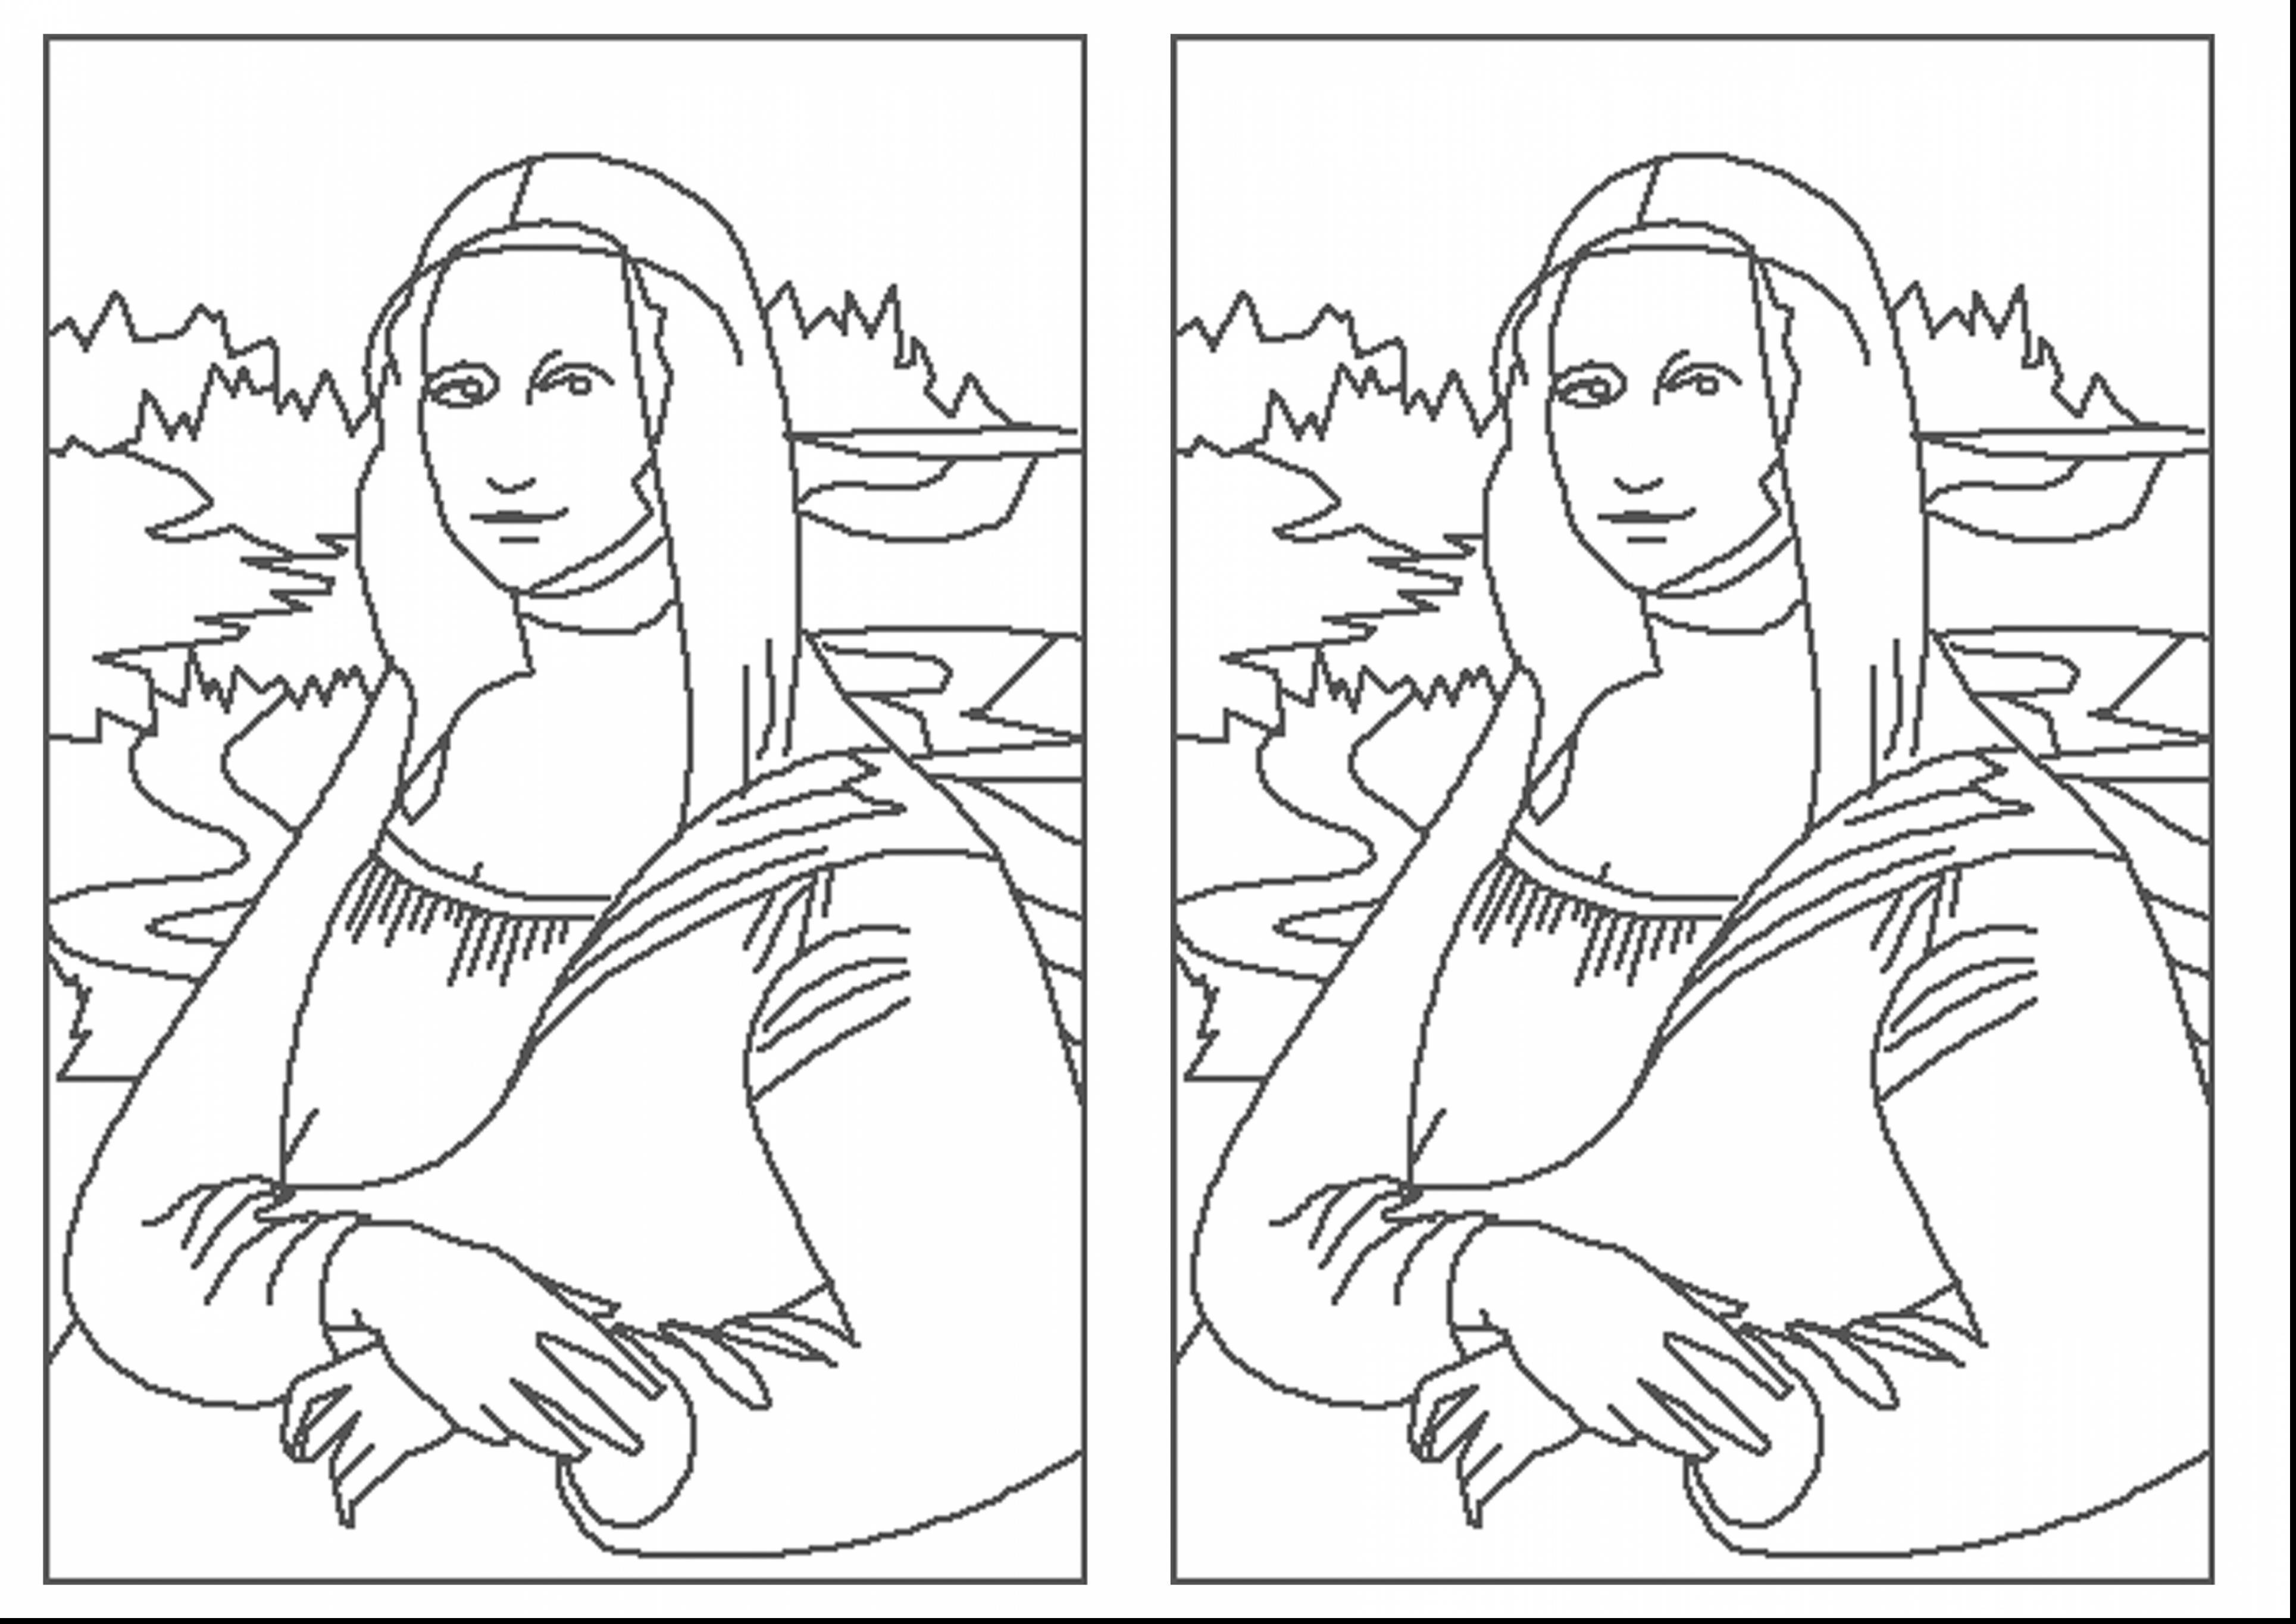 Mona Lisa Coloring Page   Coloringnori - Coloring Pages ...